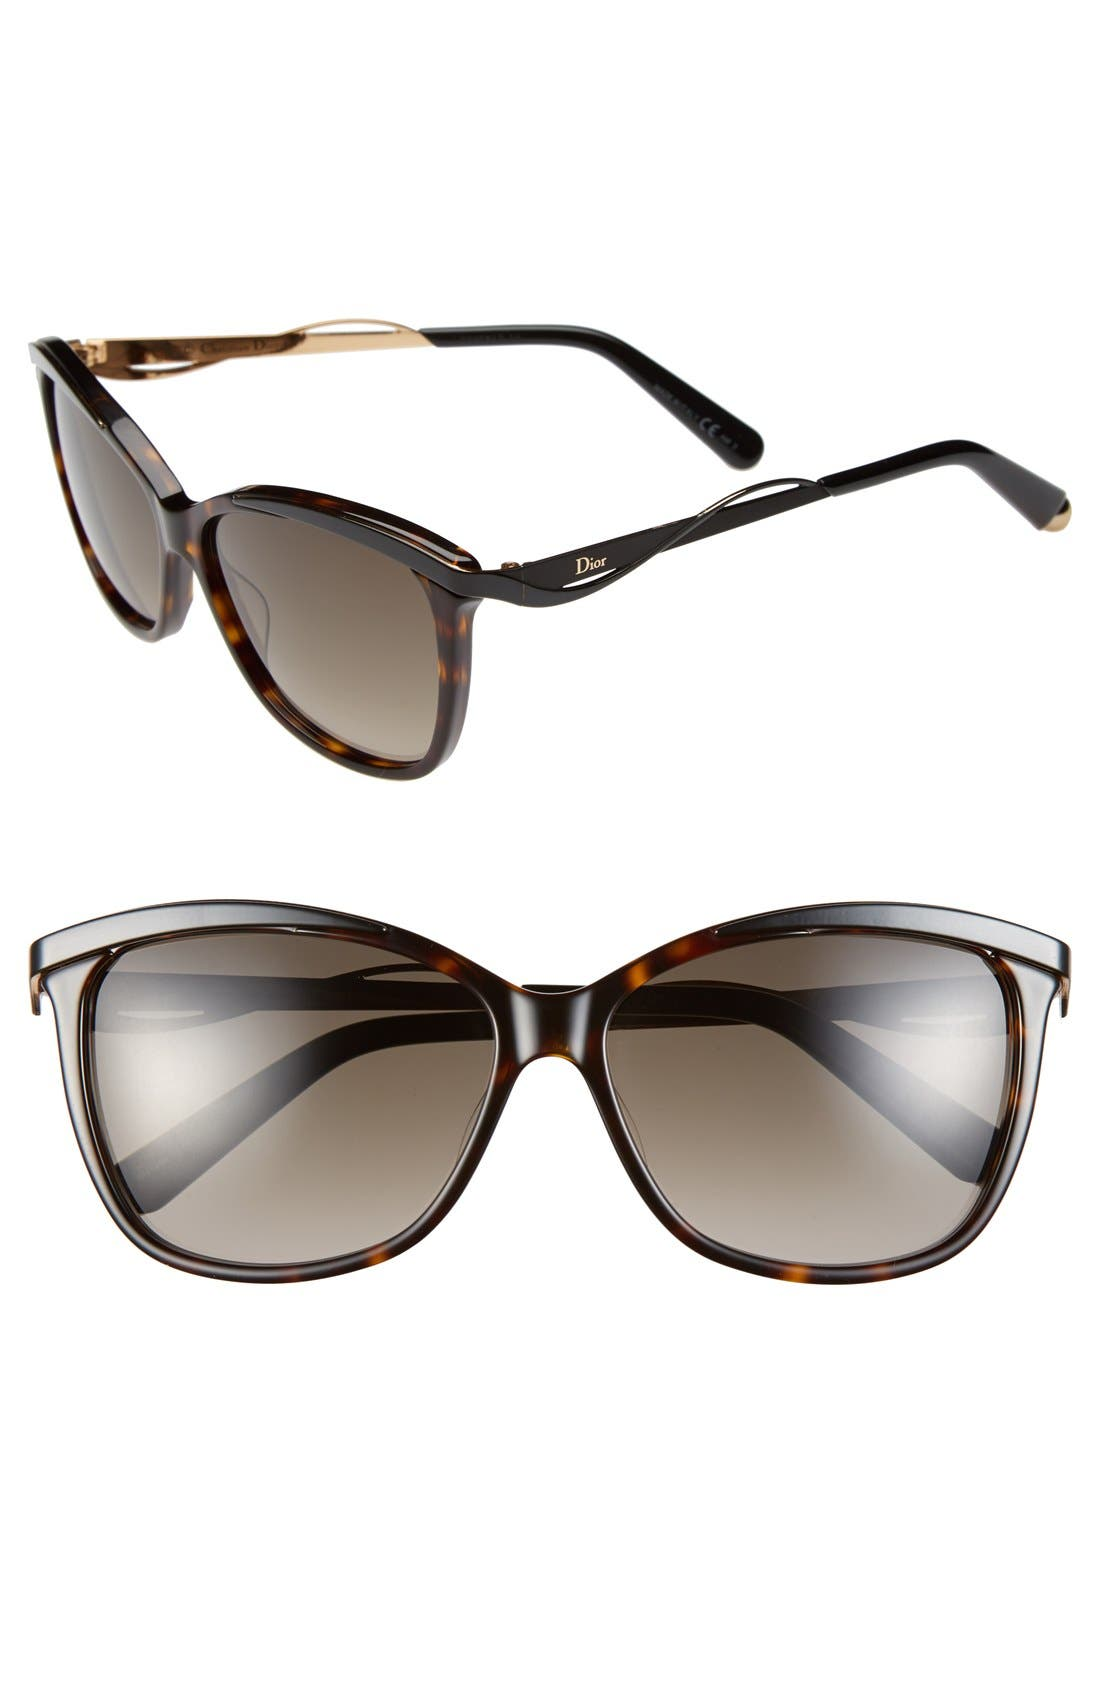 Main Image - Dior Metal Eyes 2 57mm Sunglasses